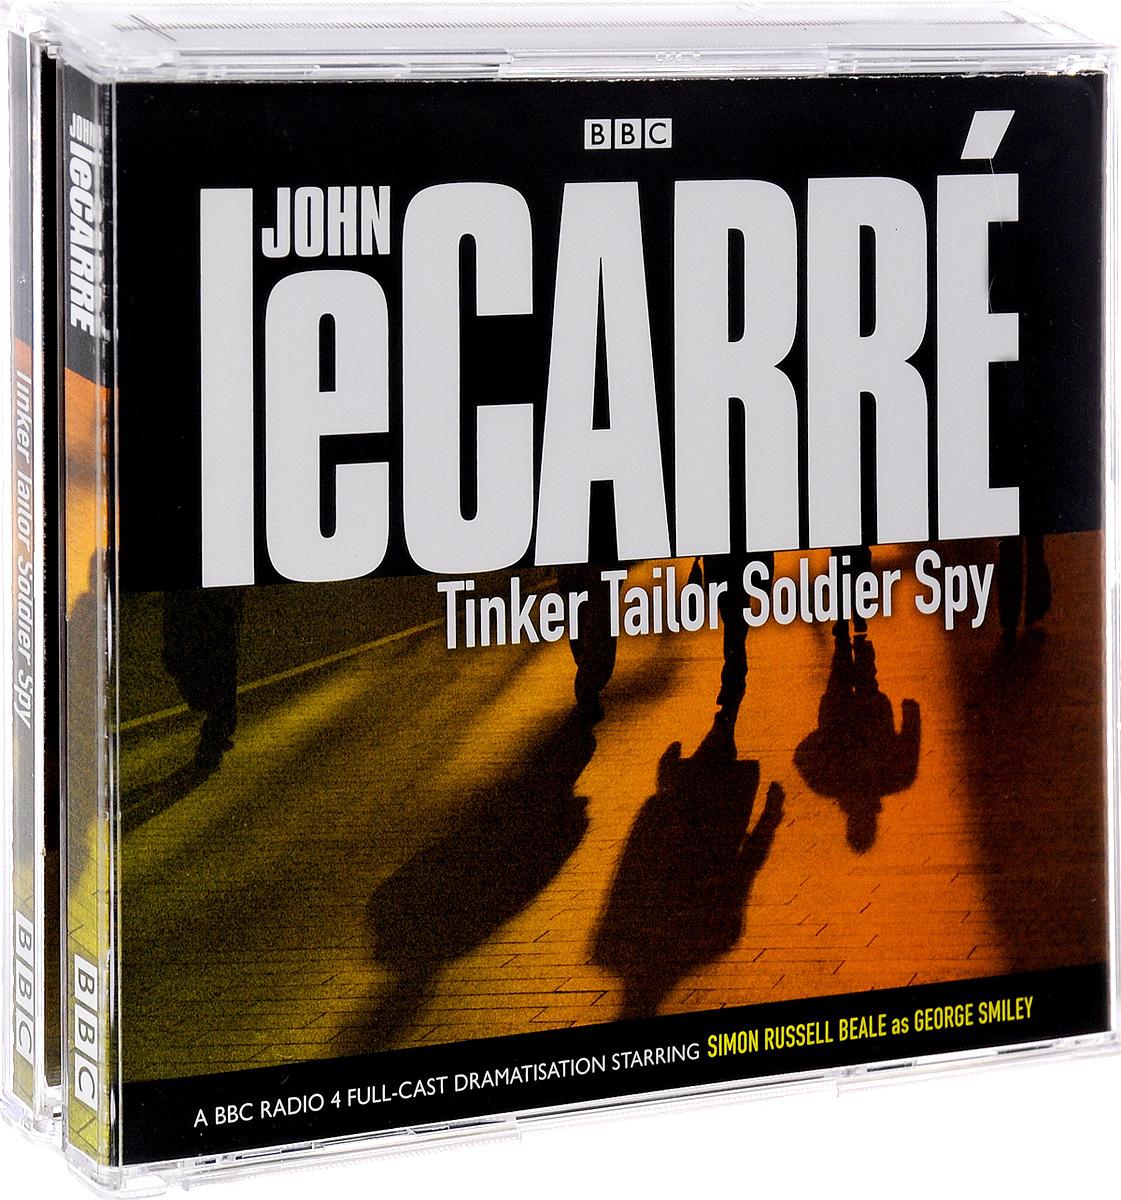 Tinker Tailor Soldier Spy (аудиокнига на 3 CD)